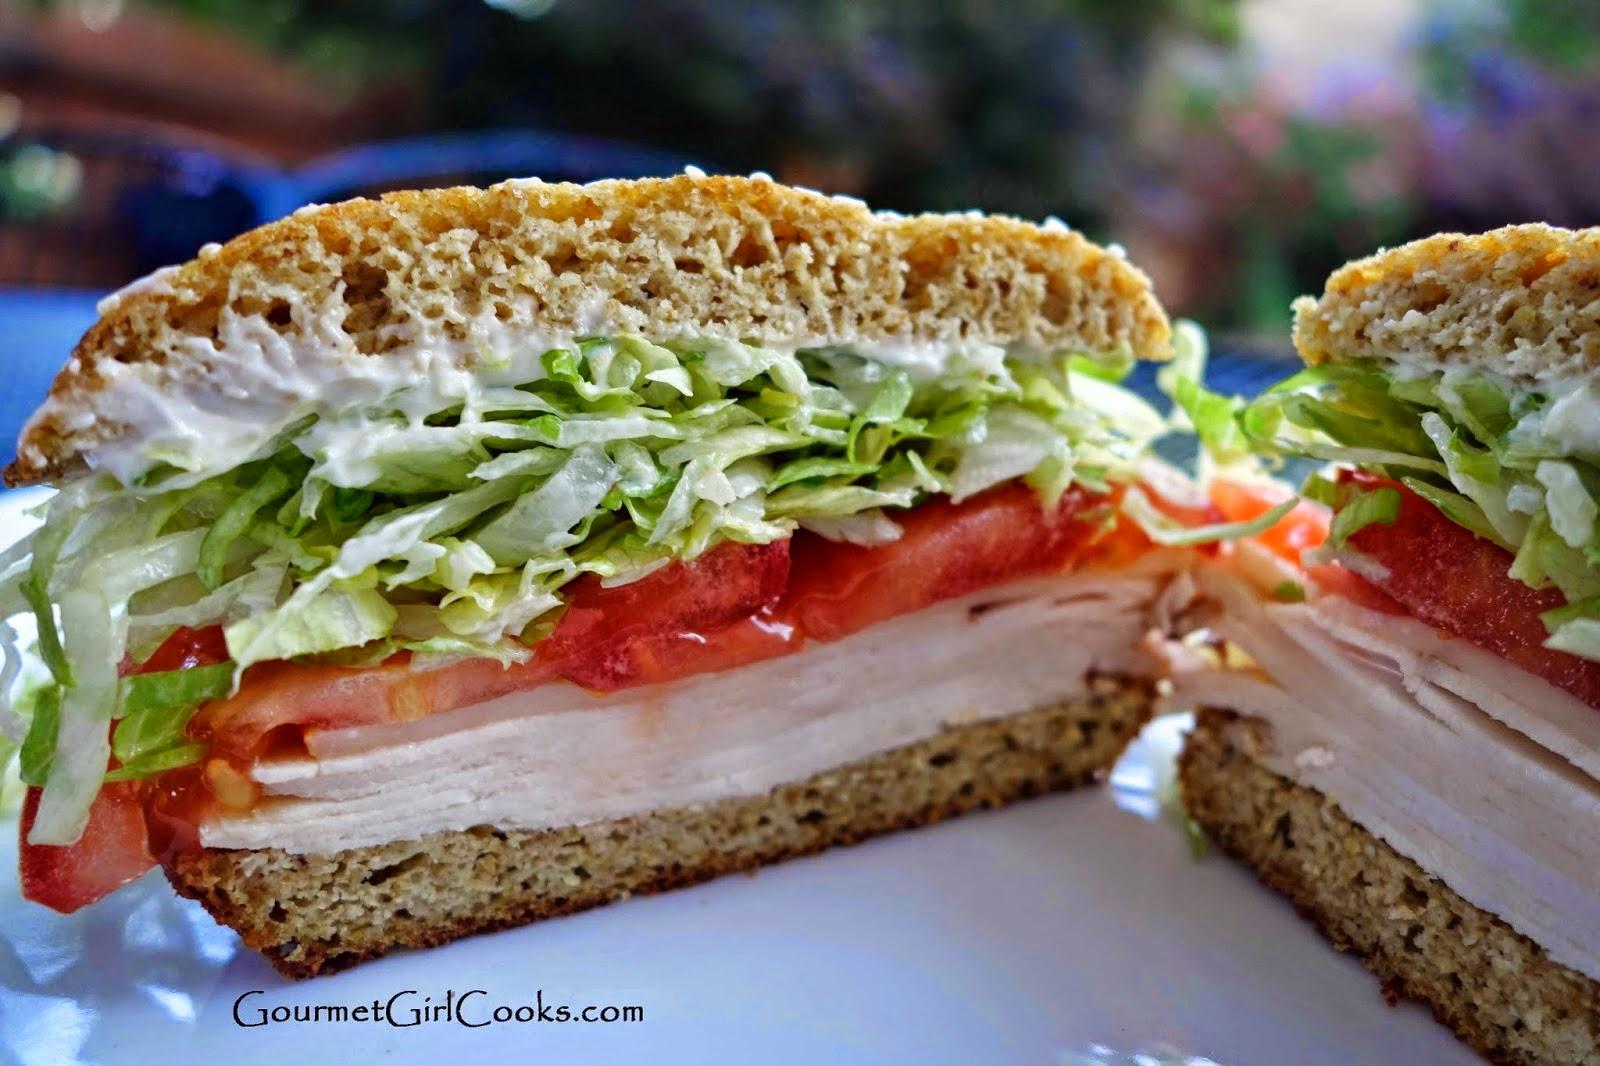 Sesame Seed Sandwich Buns